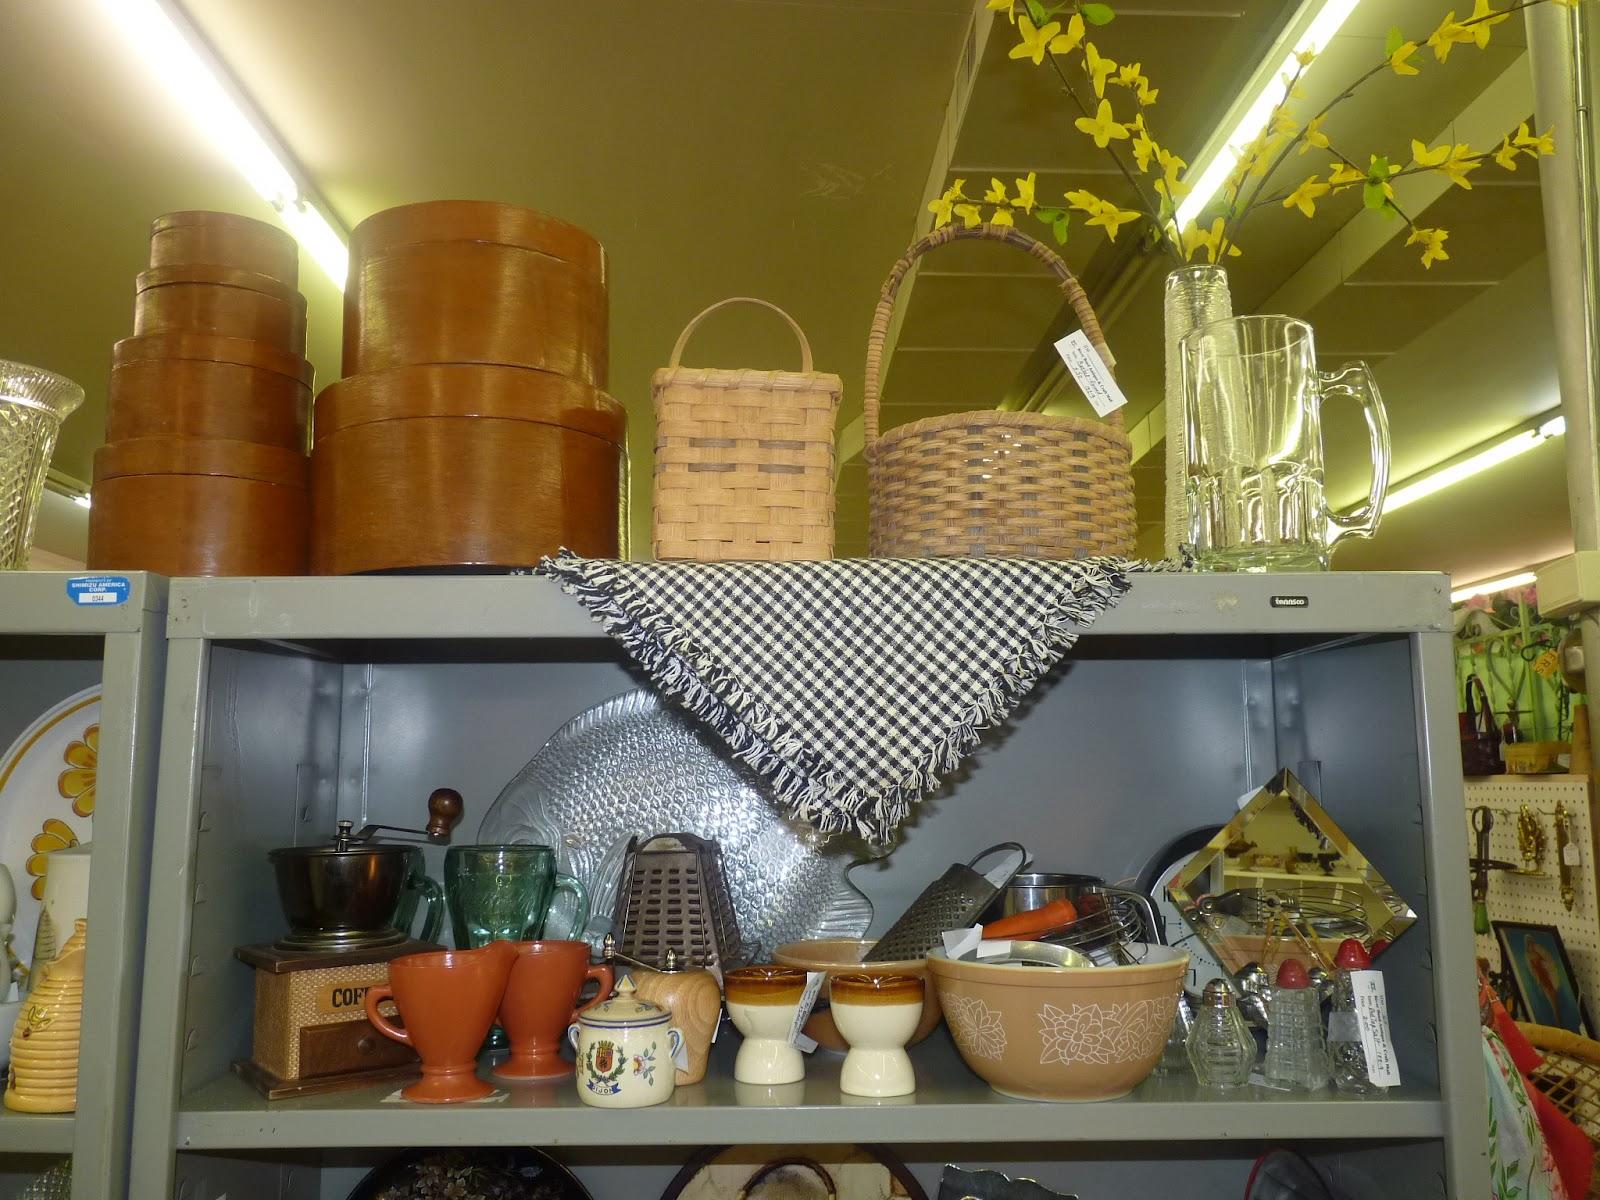 Kitchen Shelves Decorating